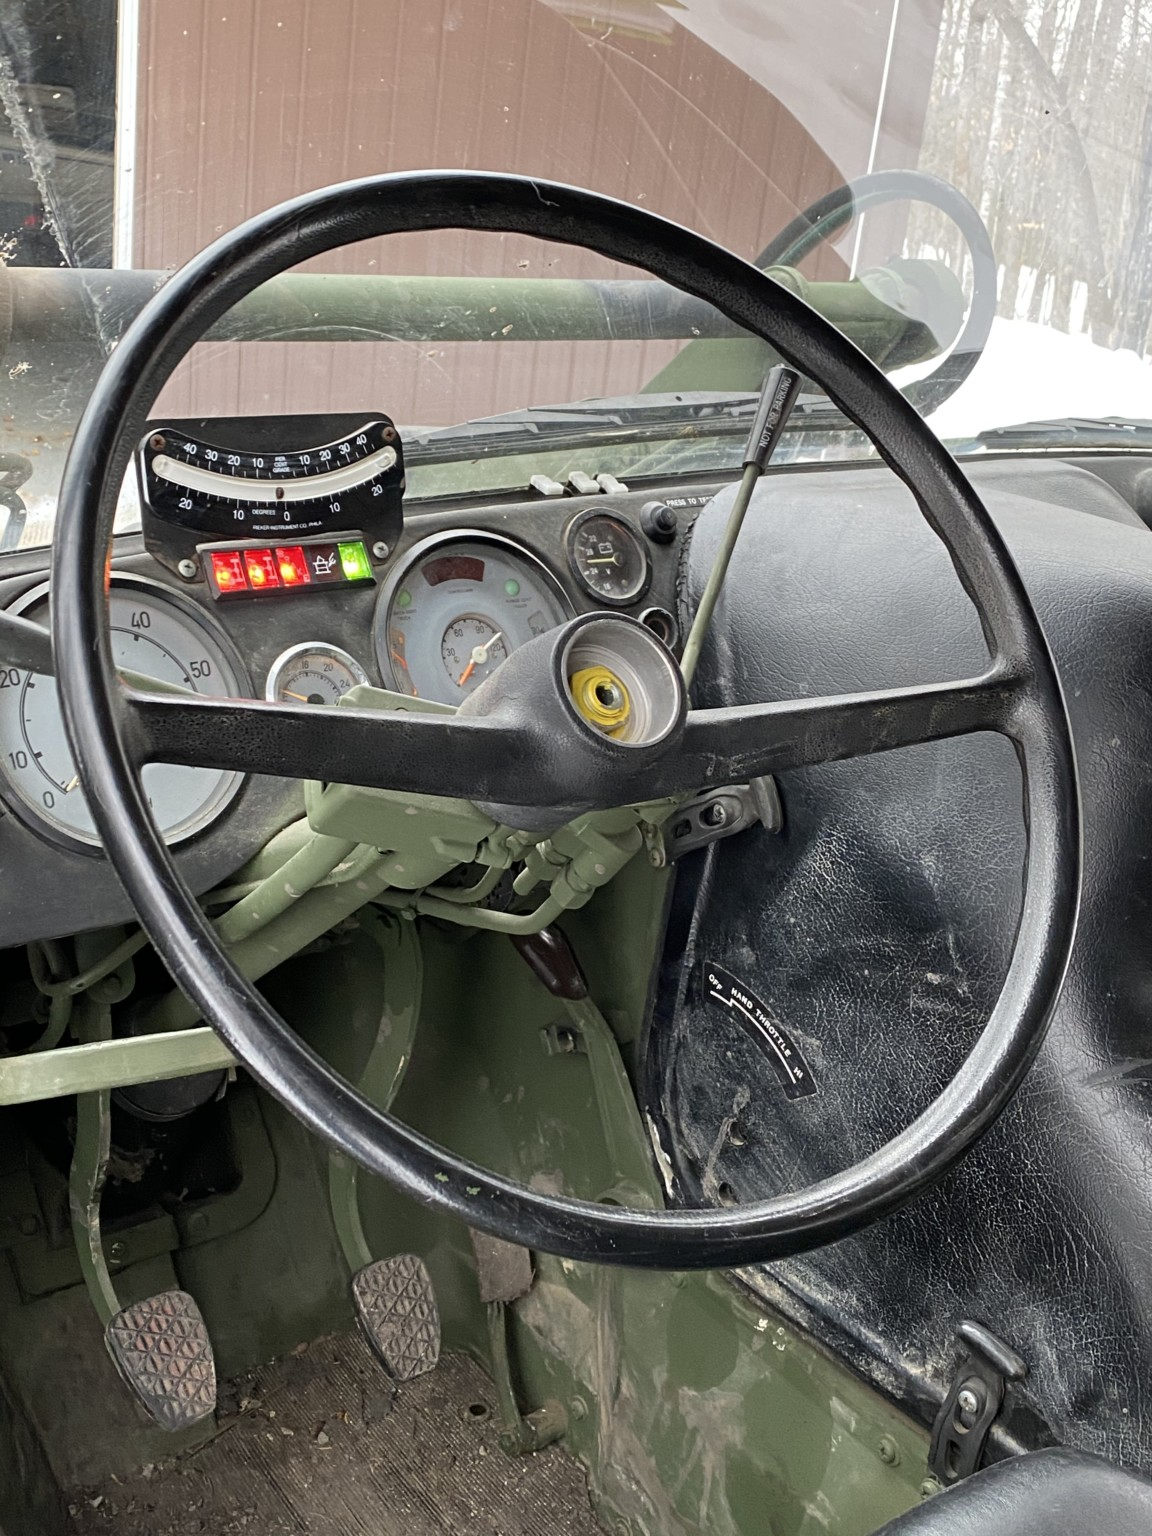 Petroelje unimog dashboard